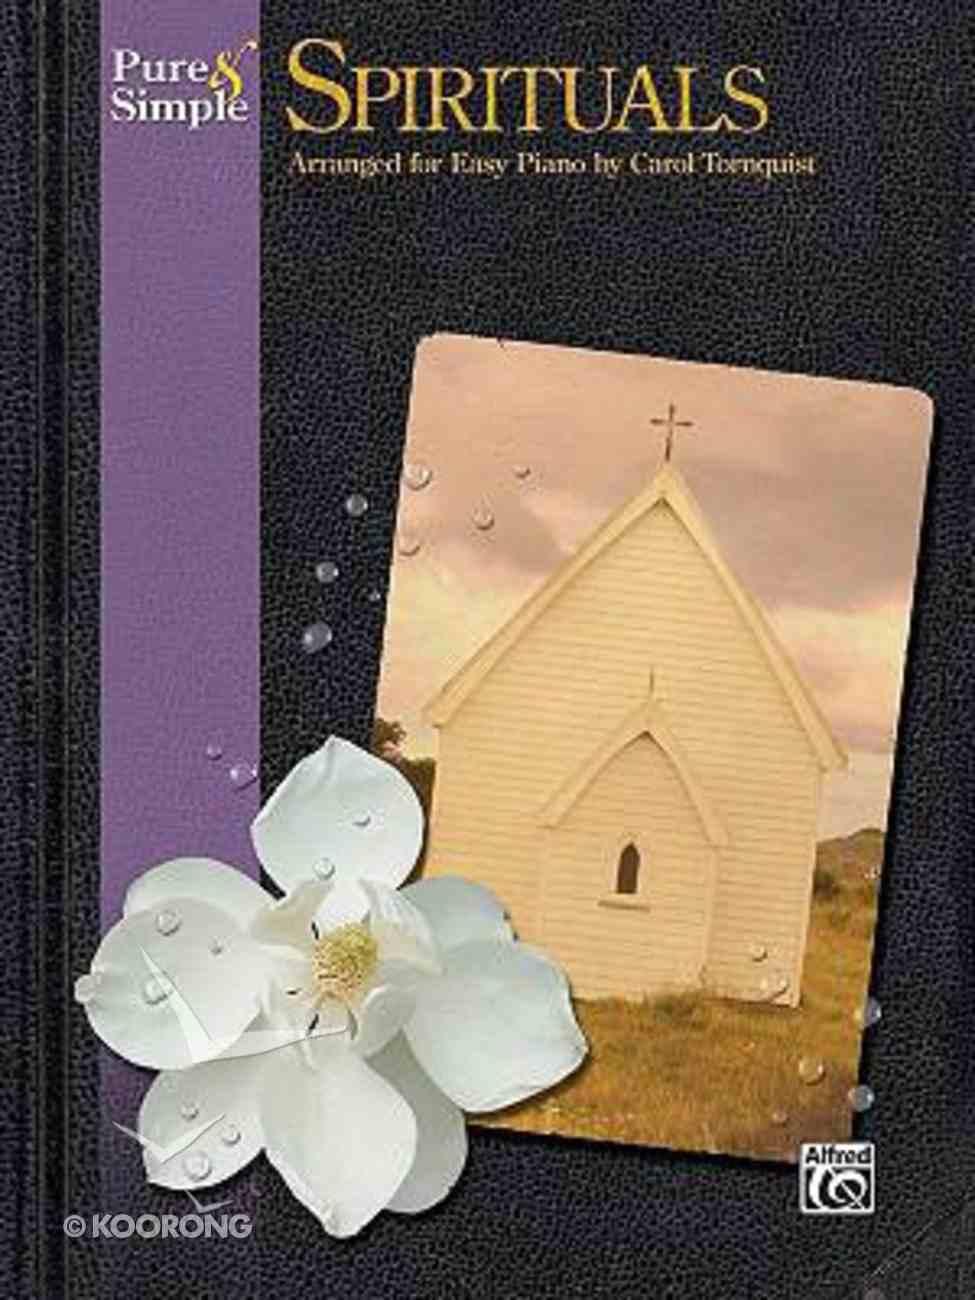 Pure & Simple Spirituals (Music Book) Paperback